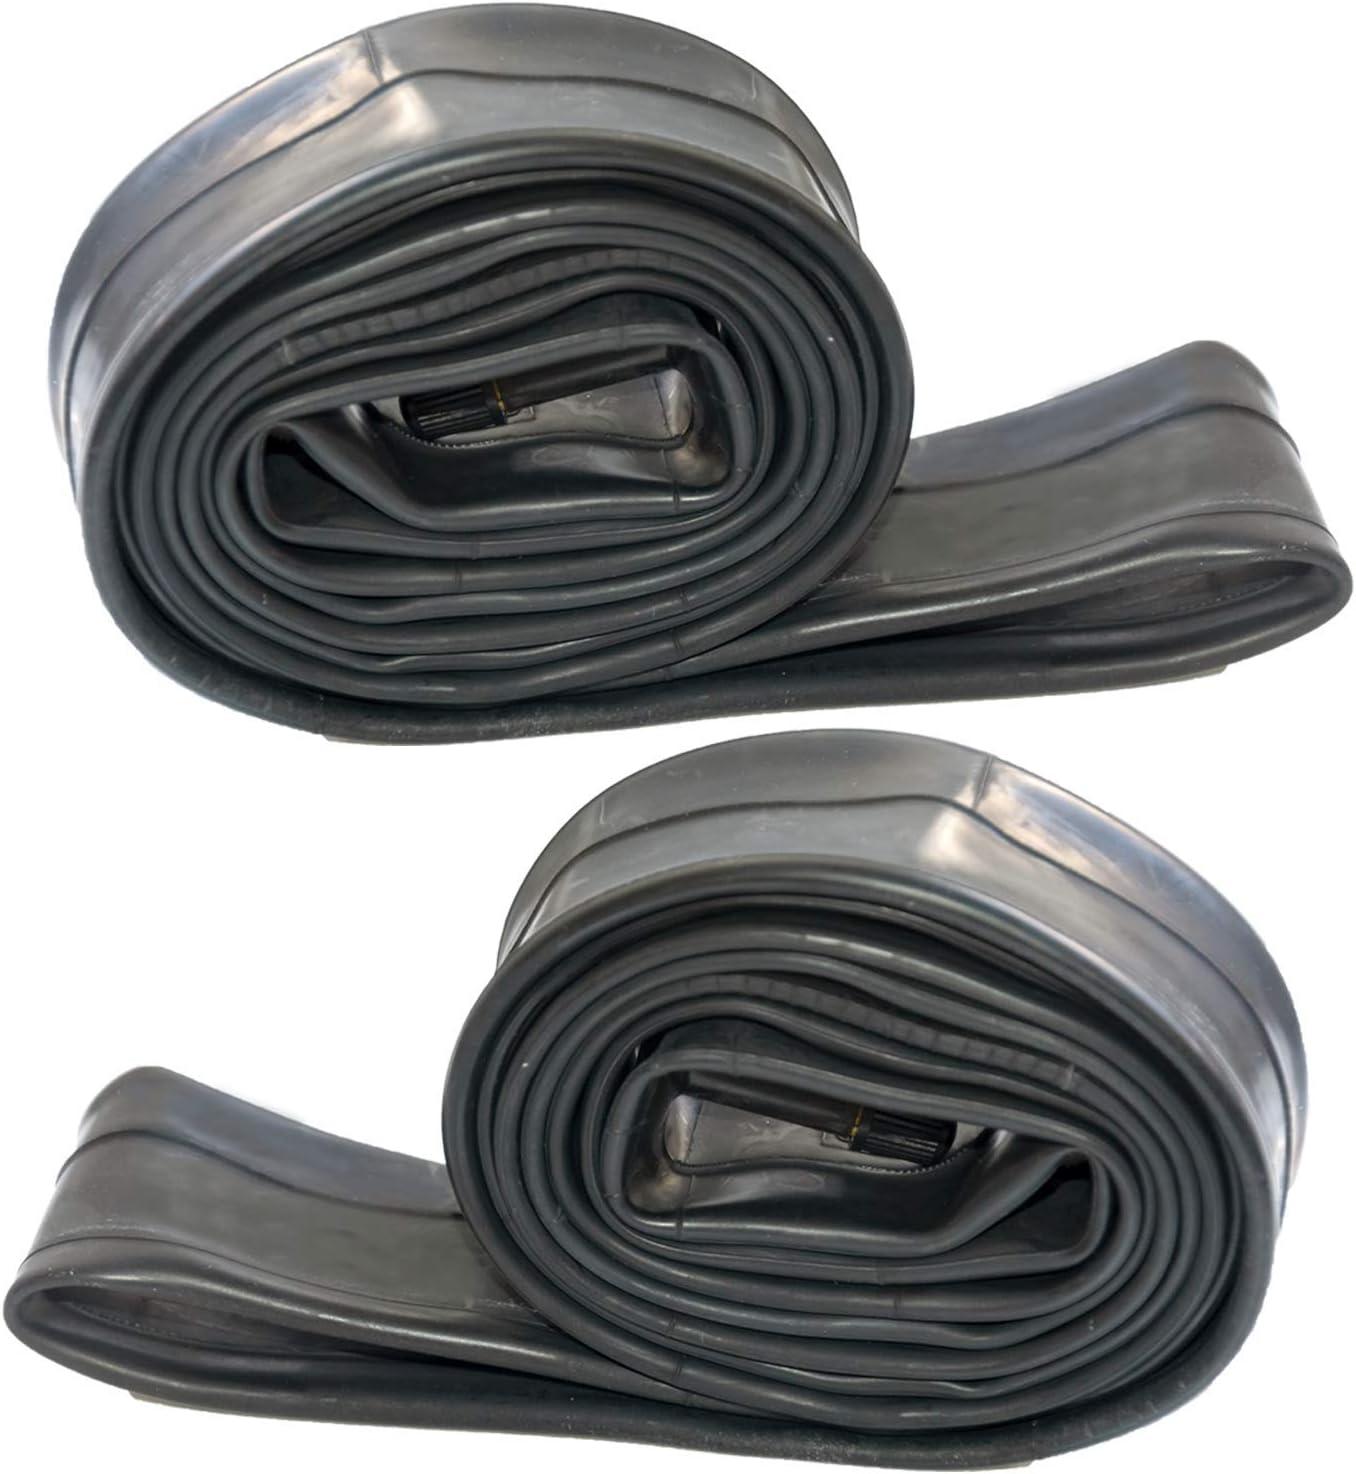 Kenda Cycle//Vélo Tube Intérieur 26 x 1.5 1.75 2.125 Schrader Valve SV A//V 1.95